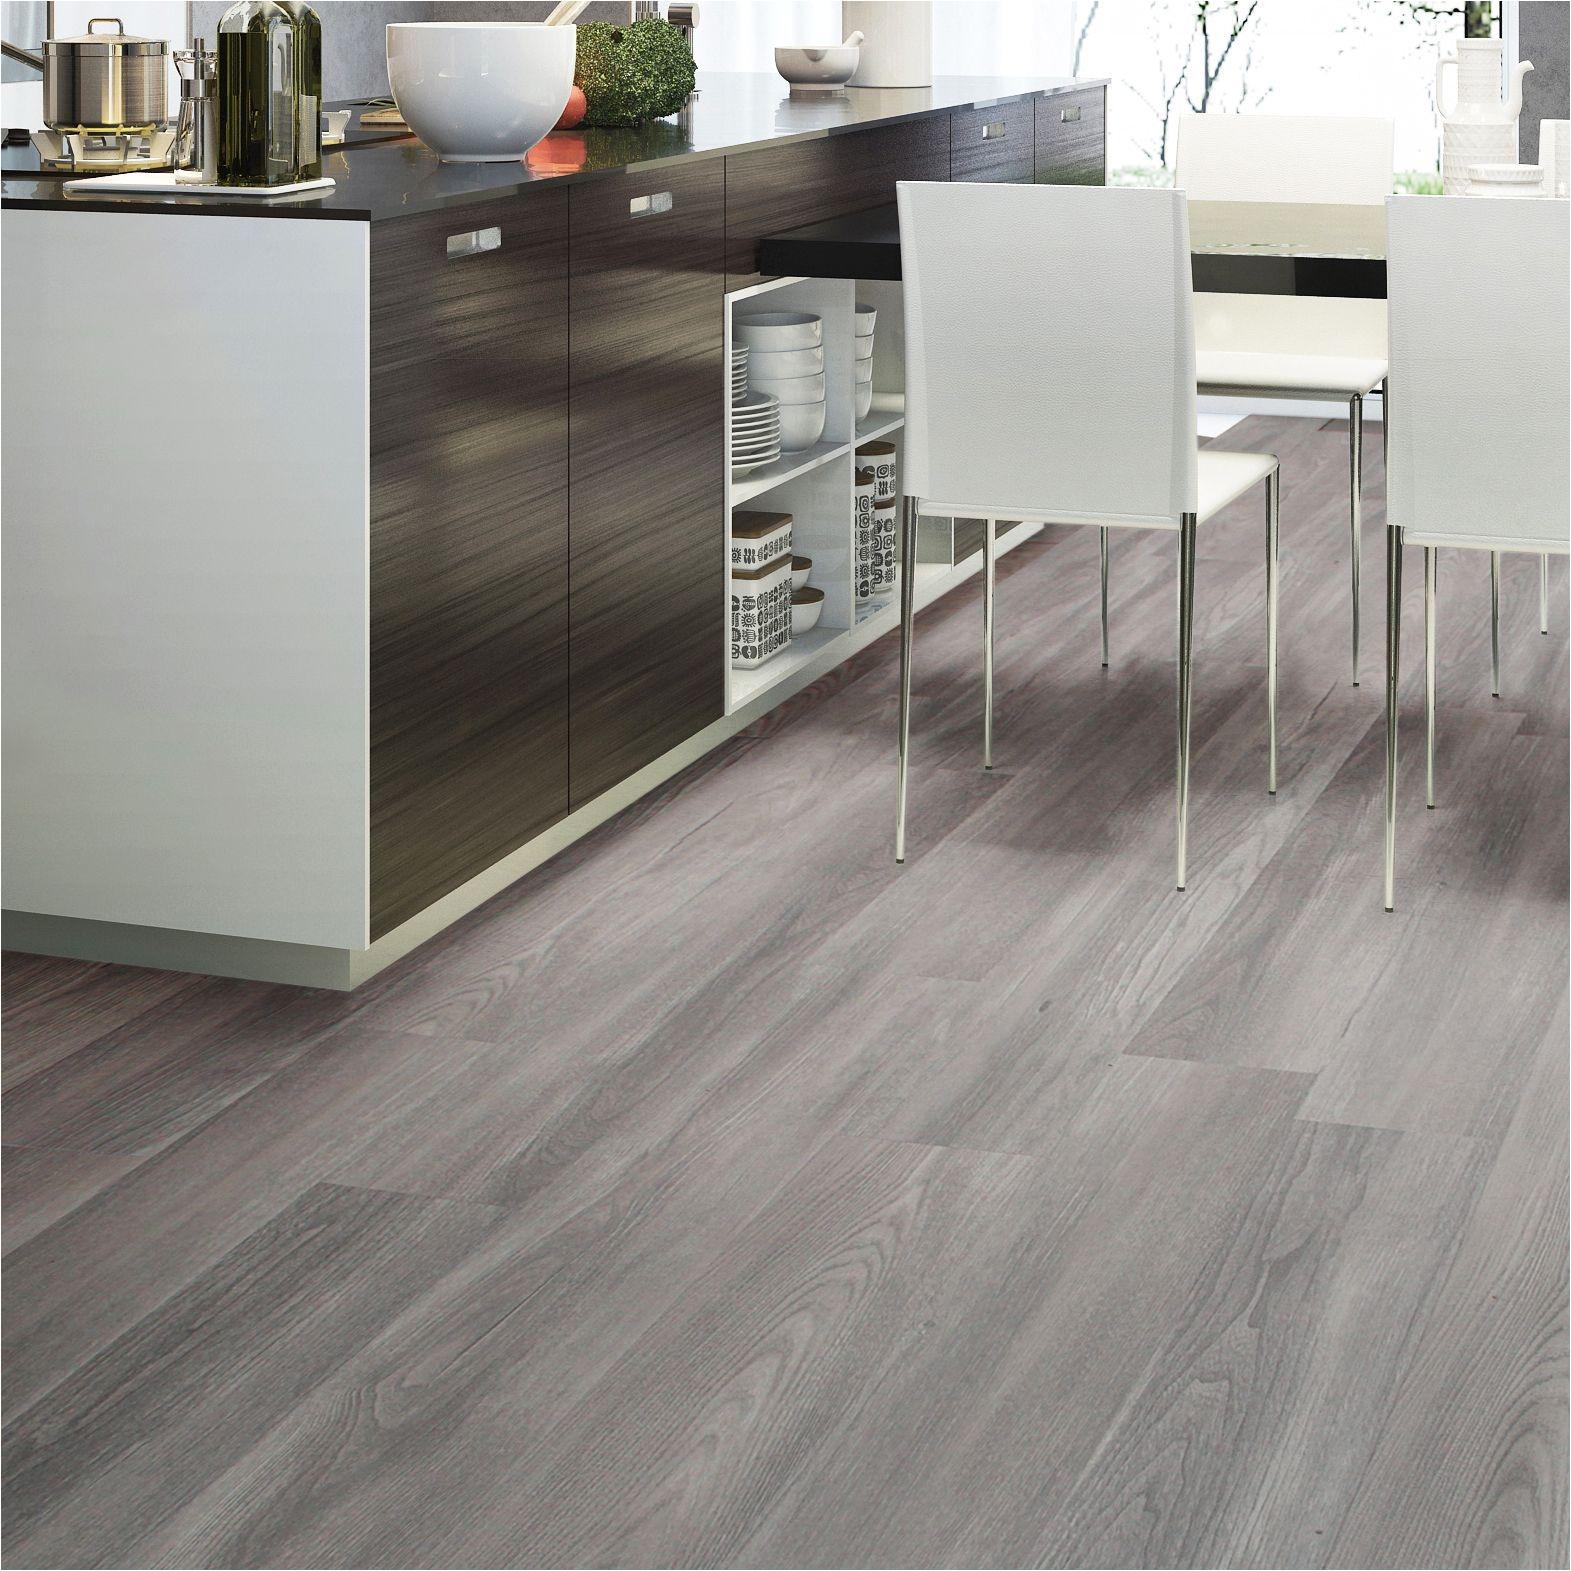 diy at b q for grey wood vinyl flooring image source diy com